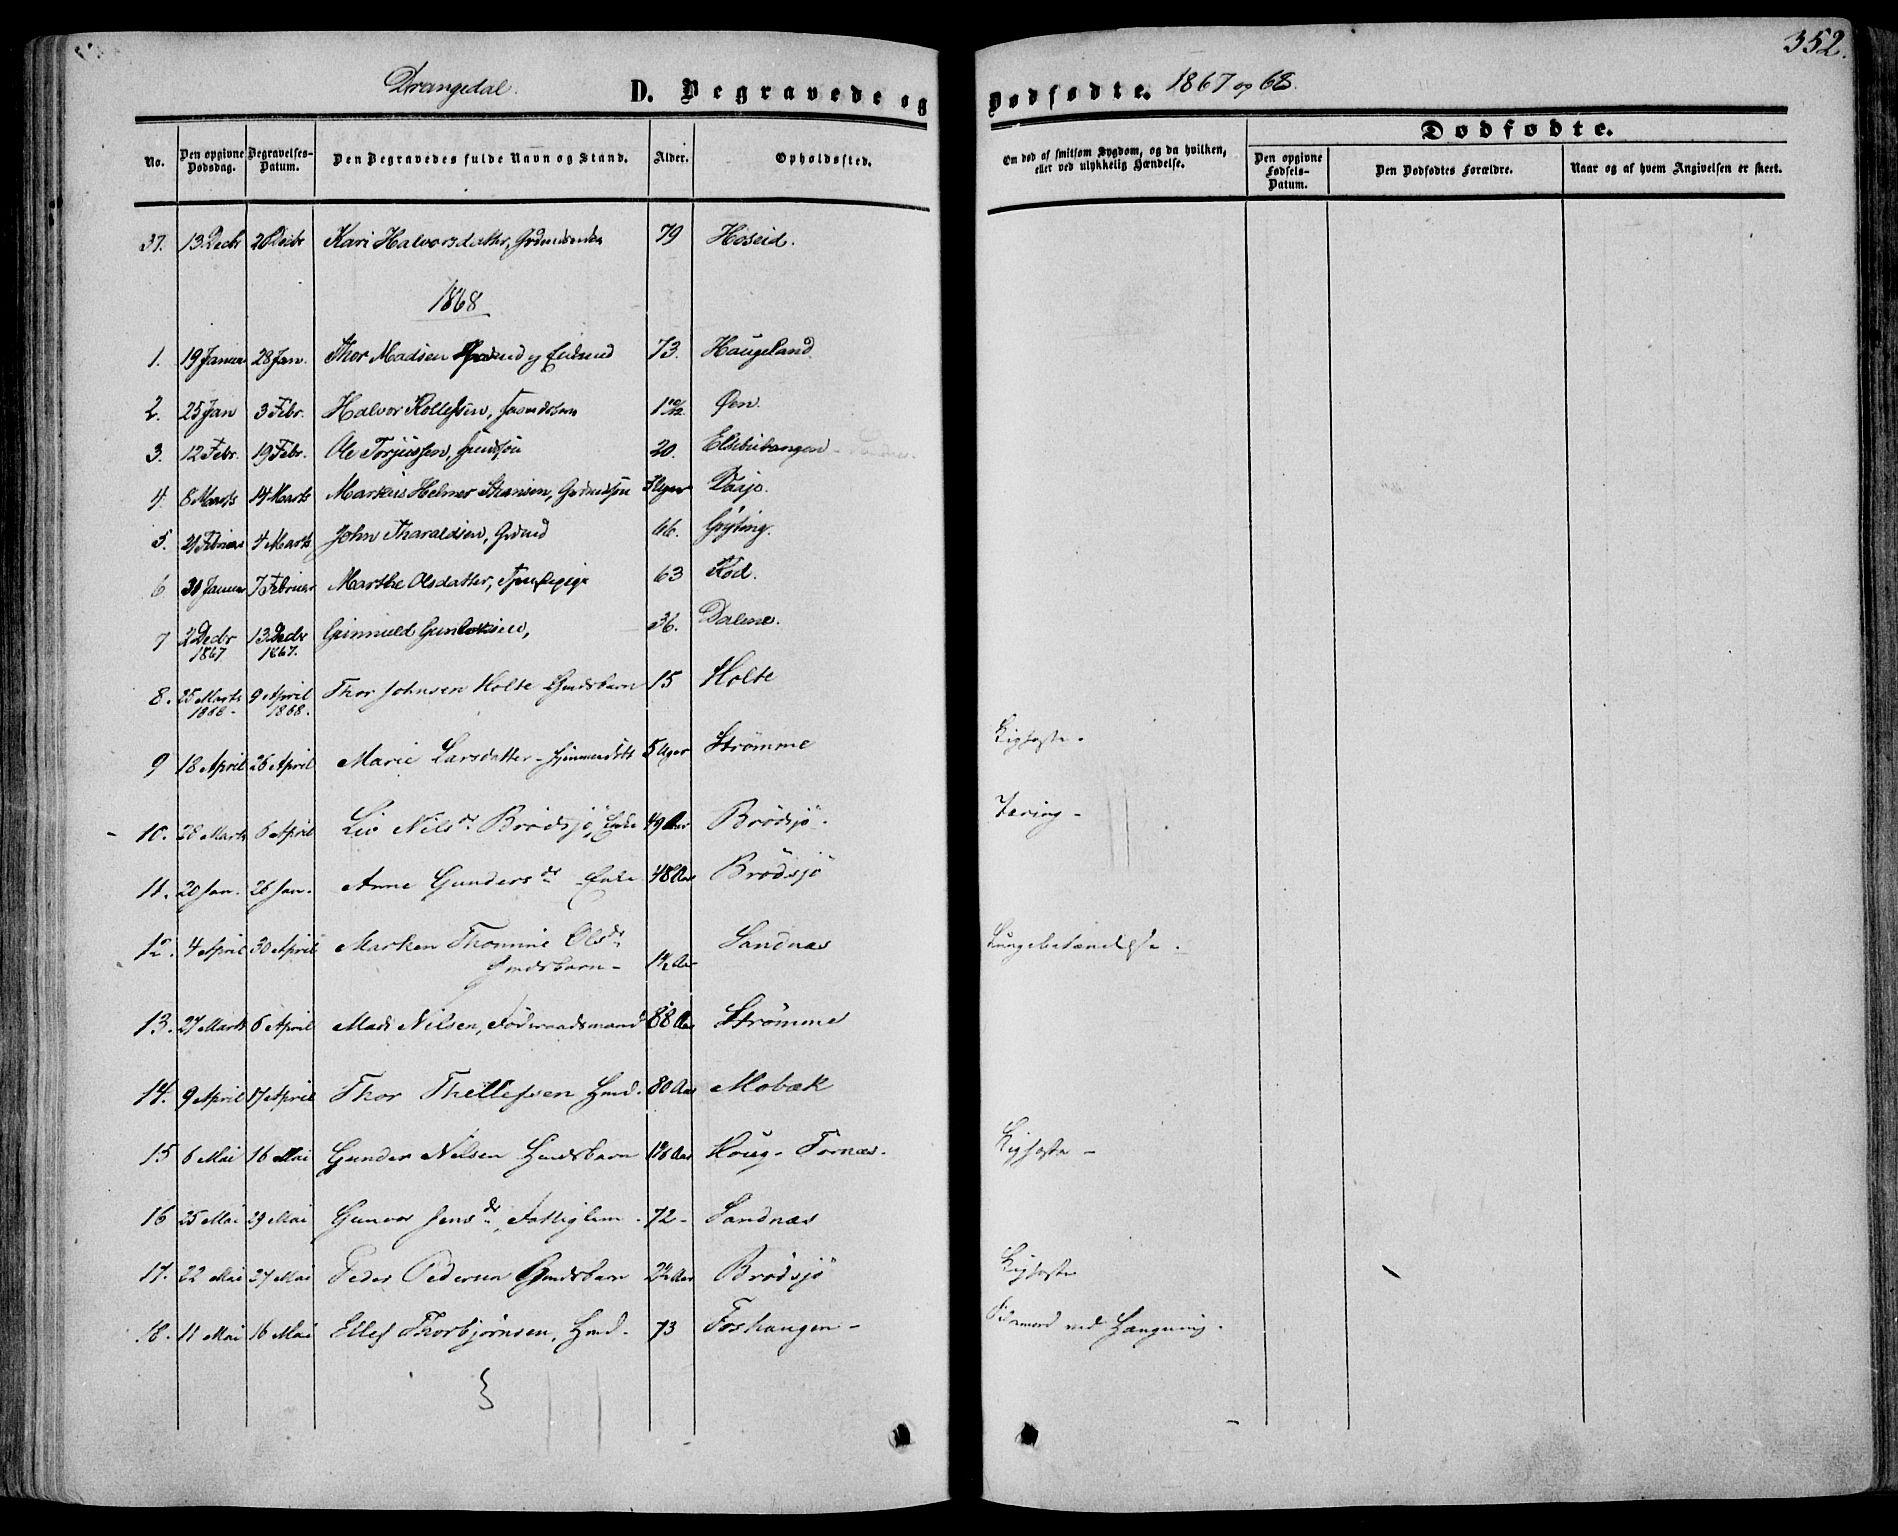 SAKO, Drangedal kirkebøker, F/Fa/L0008: Ministerialbok nr. 8, 1857-1871, s. 352